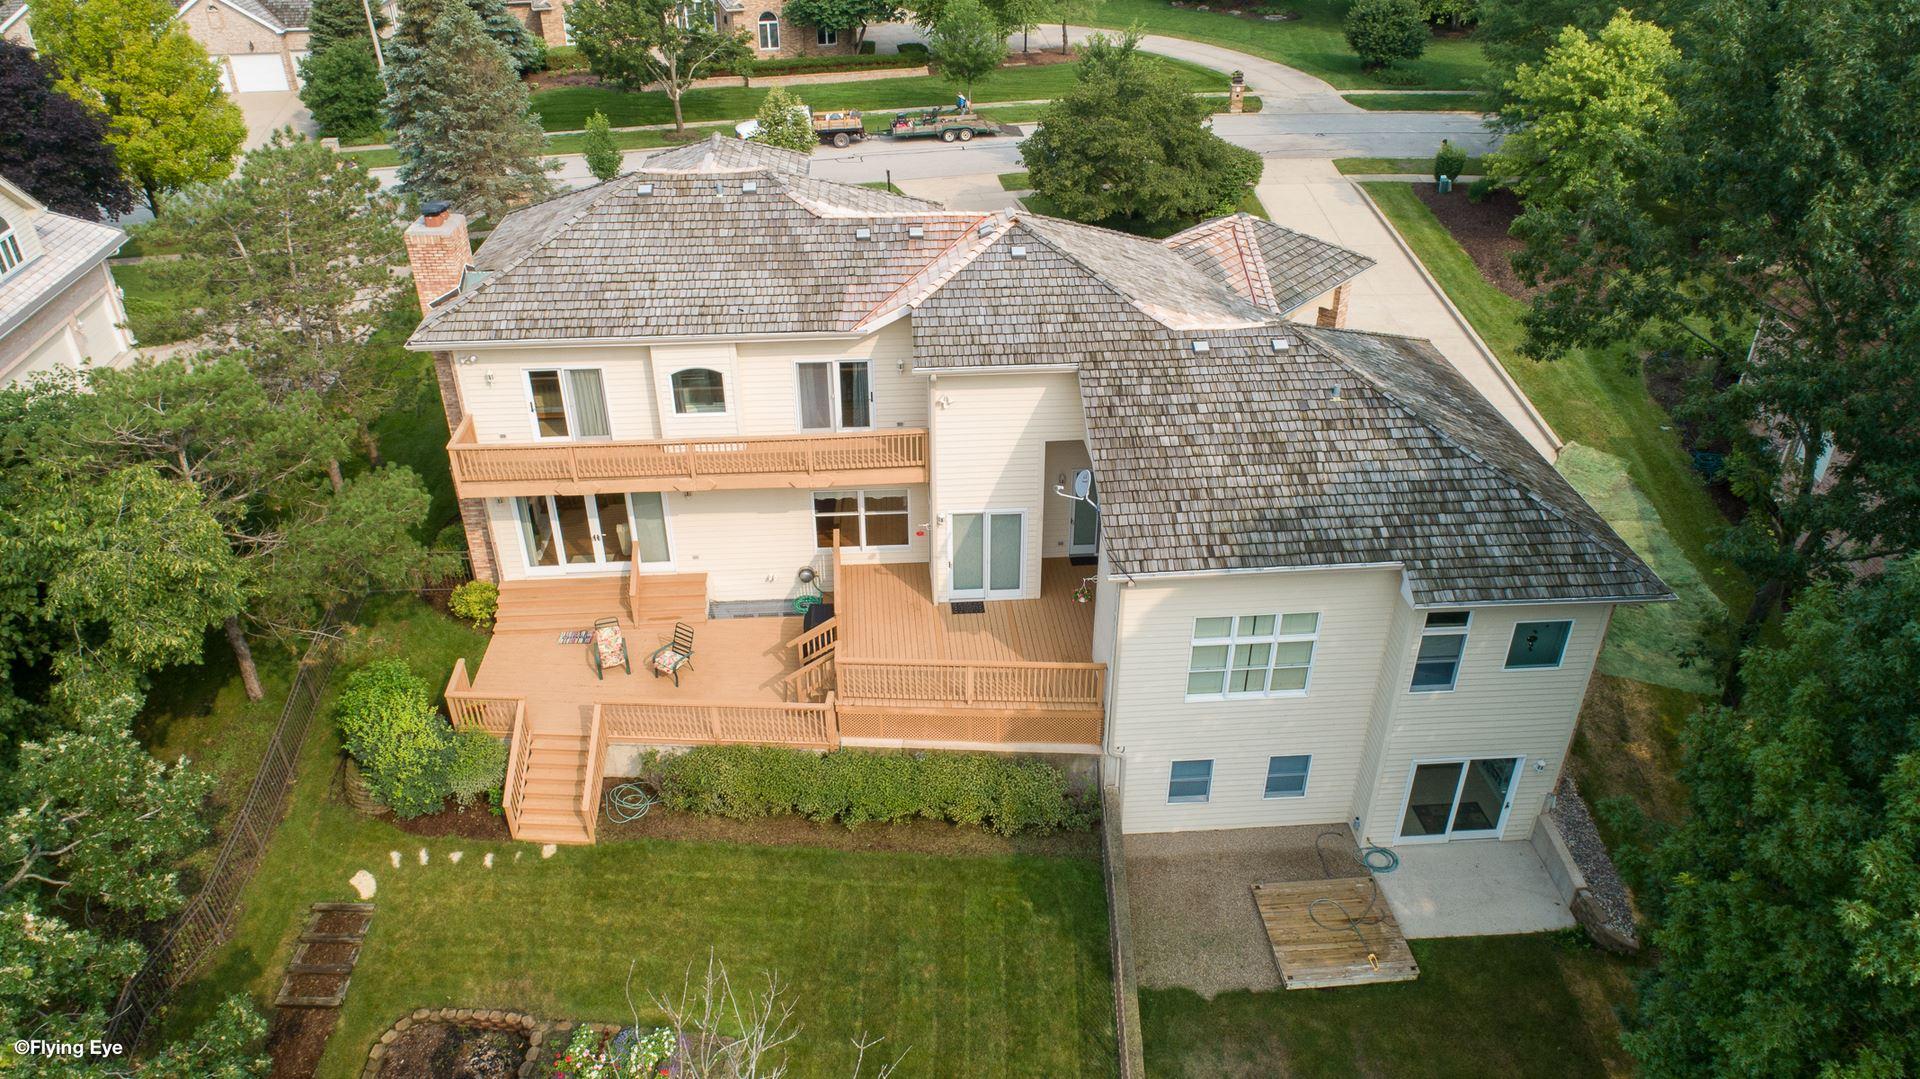 Photo of 24635 W Manor Drive, Shorewood, IL 60404 (MLS # 11161086)